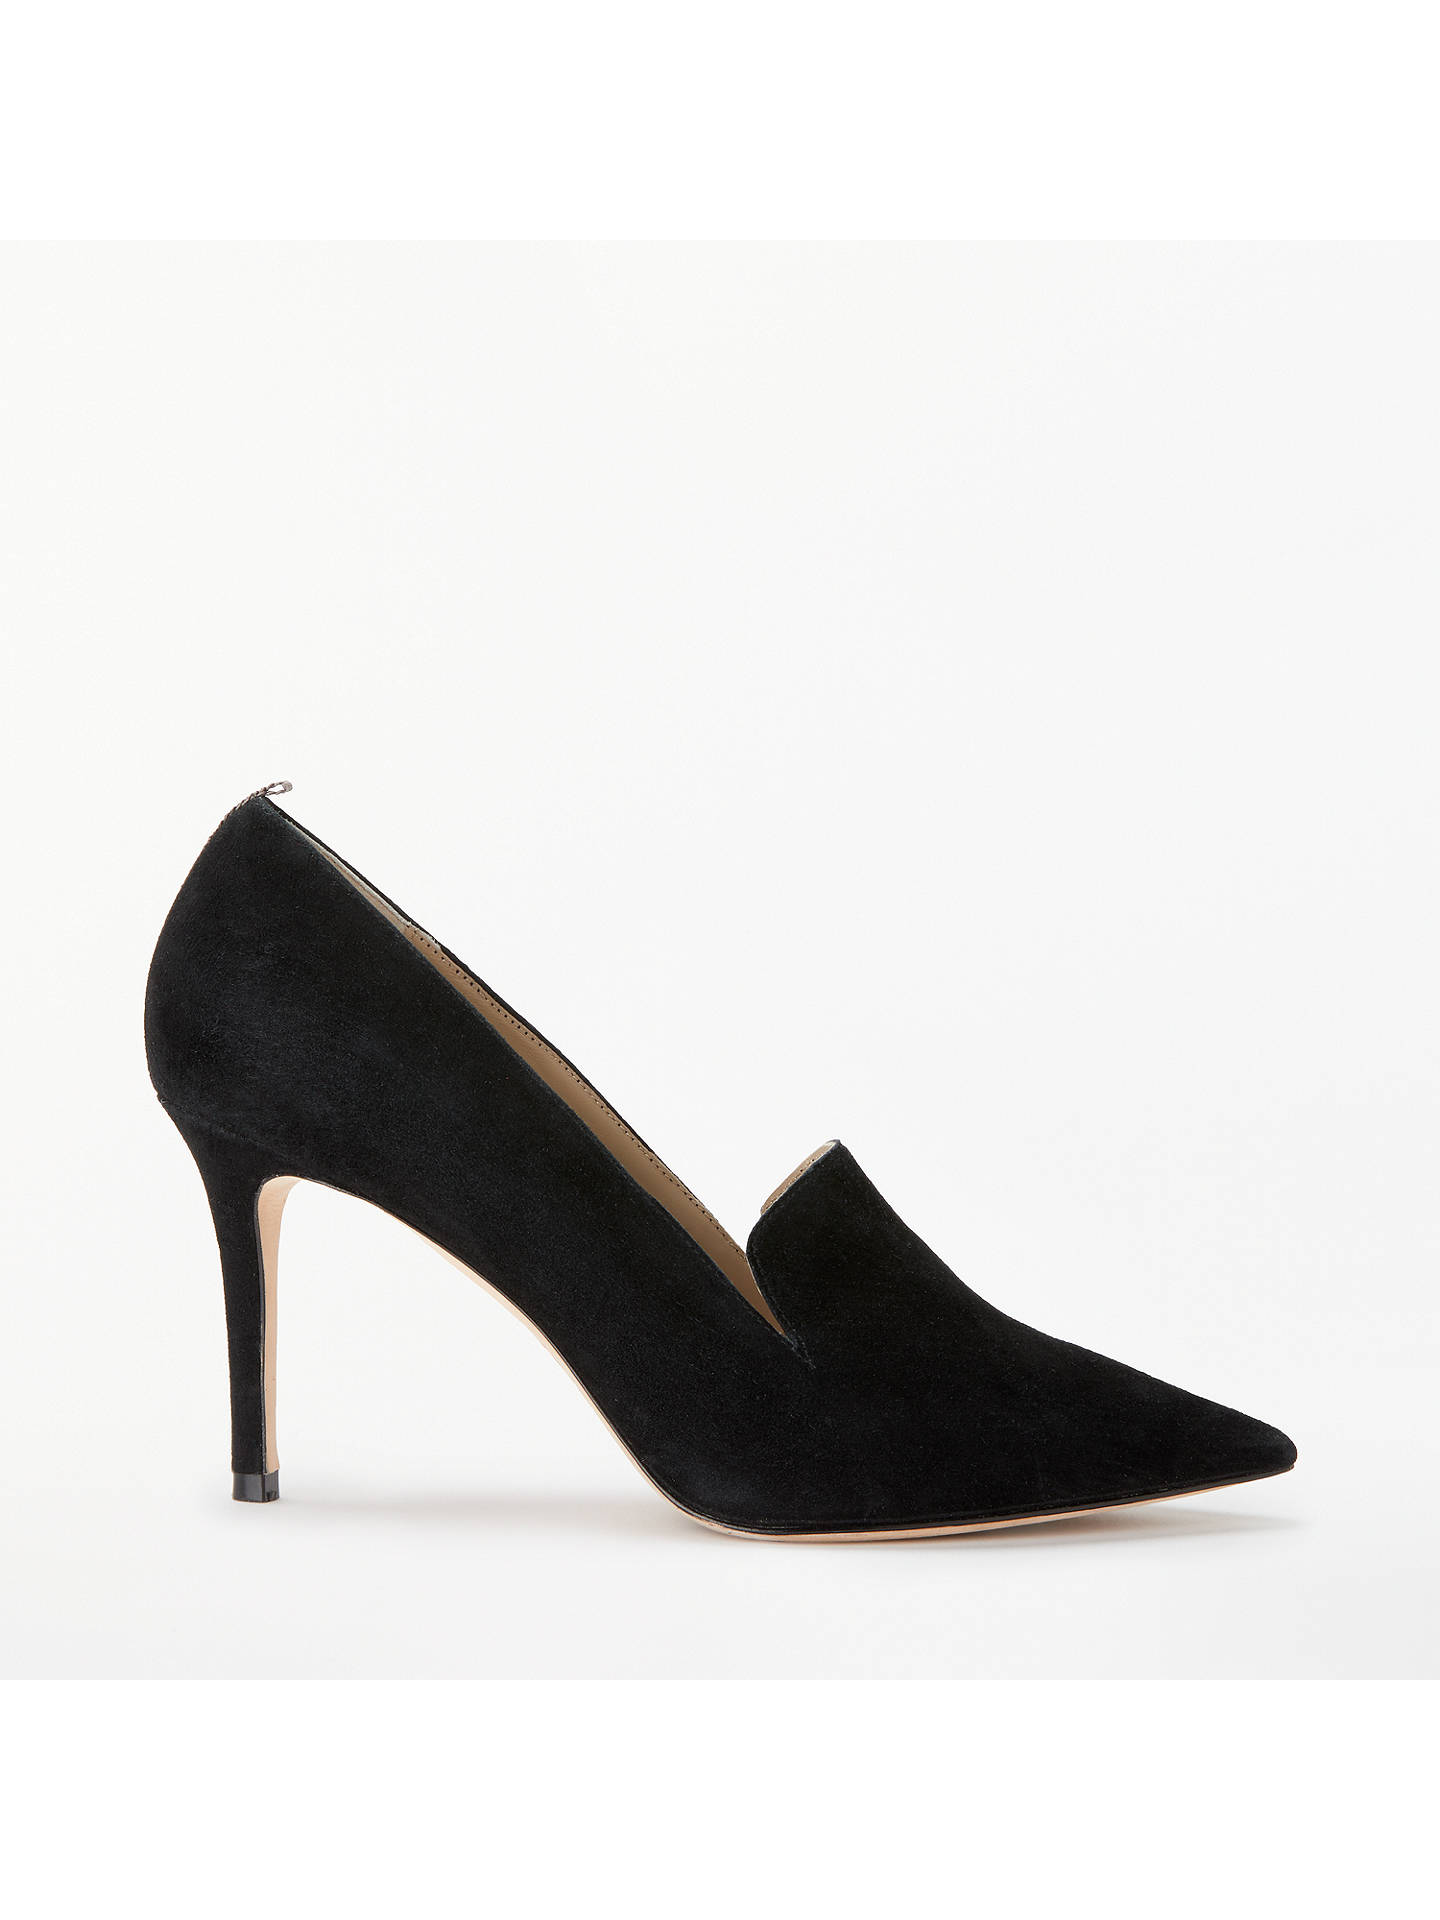 61ed70b2f30 Buy Boden Millie Suede Slipper Stiletto Heel Shoes